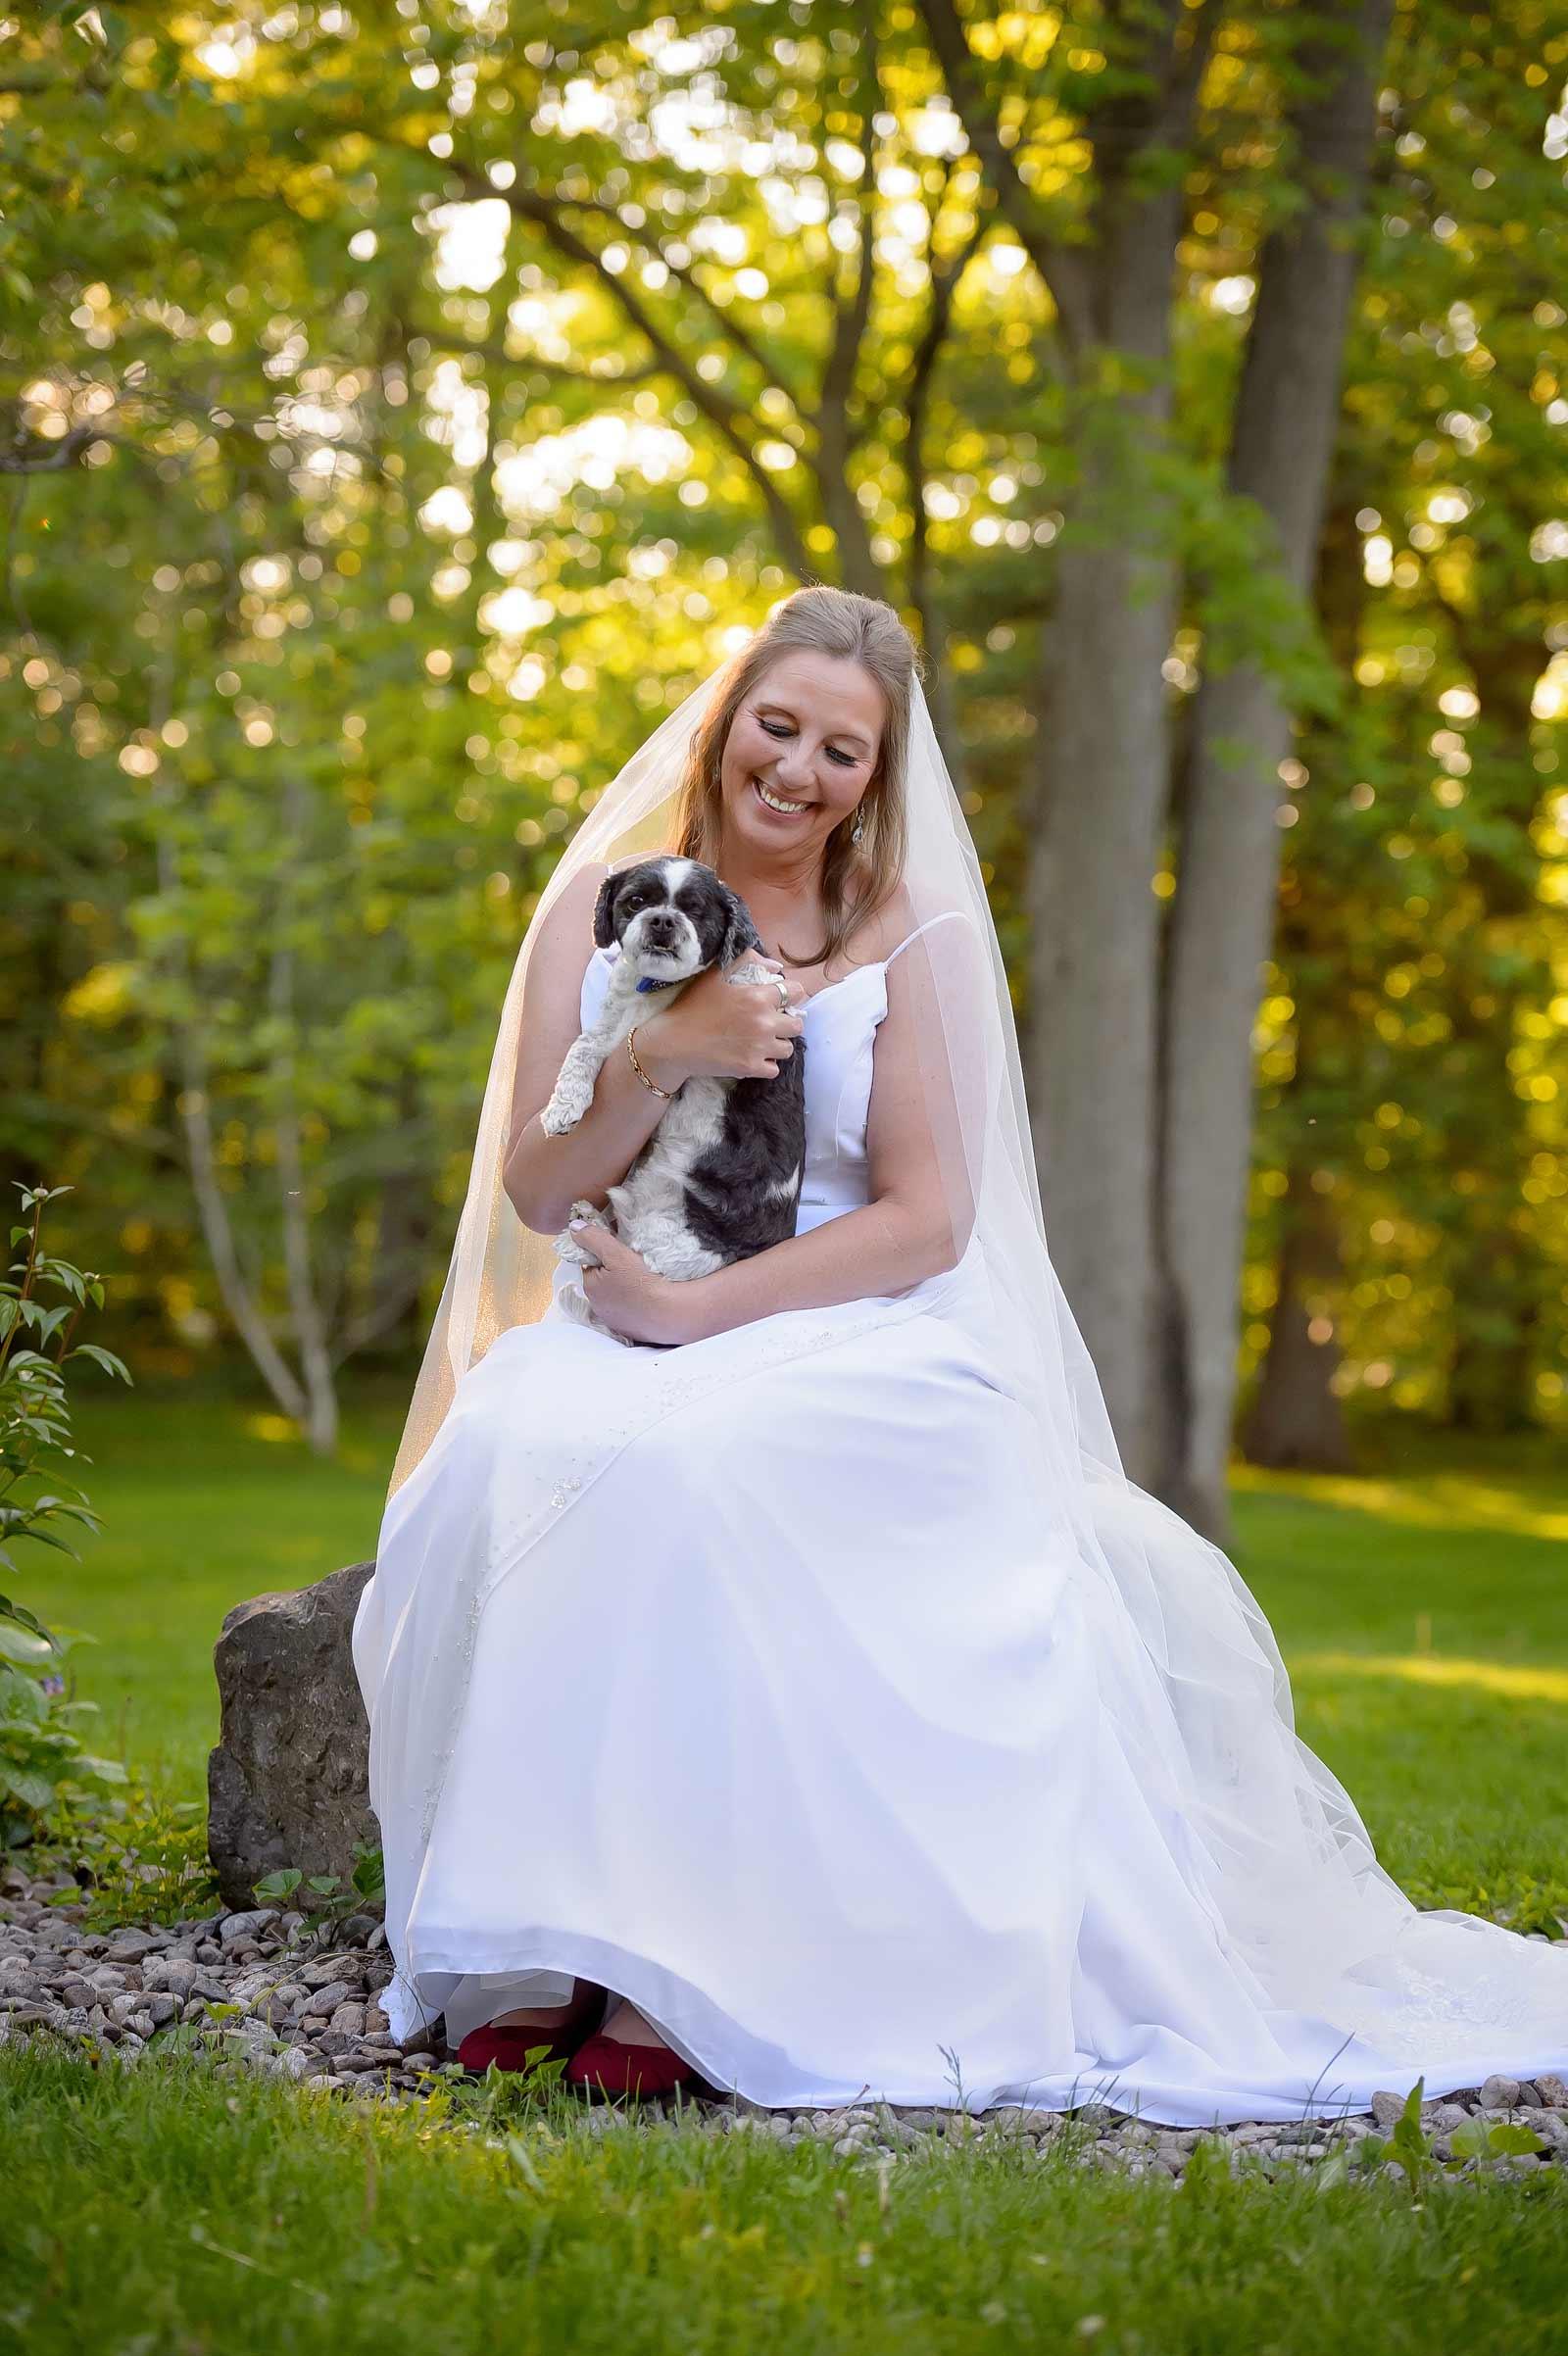 BrendaPatrick-wedding-sneakpeek-07